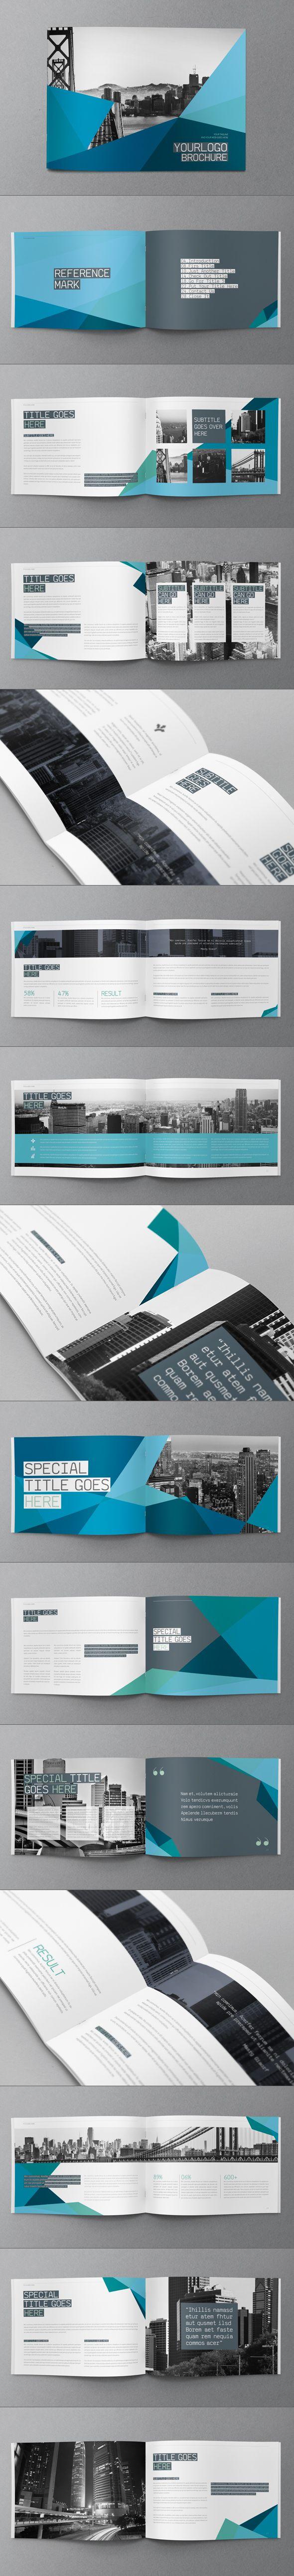 Blue Modern Brochure. Download here: http://graphicriver.net/item/blue-modern-brochure/8852088?ref=abradesign #brochure #design